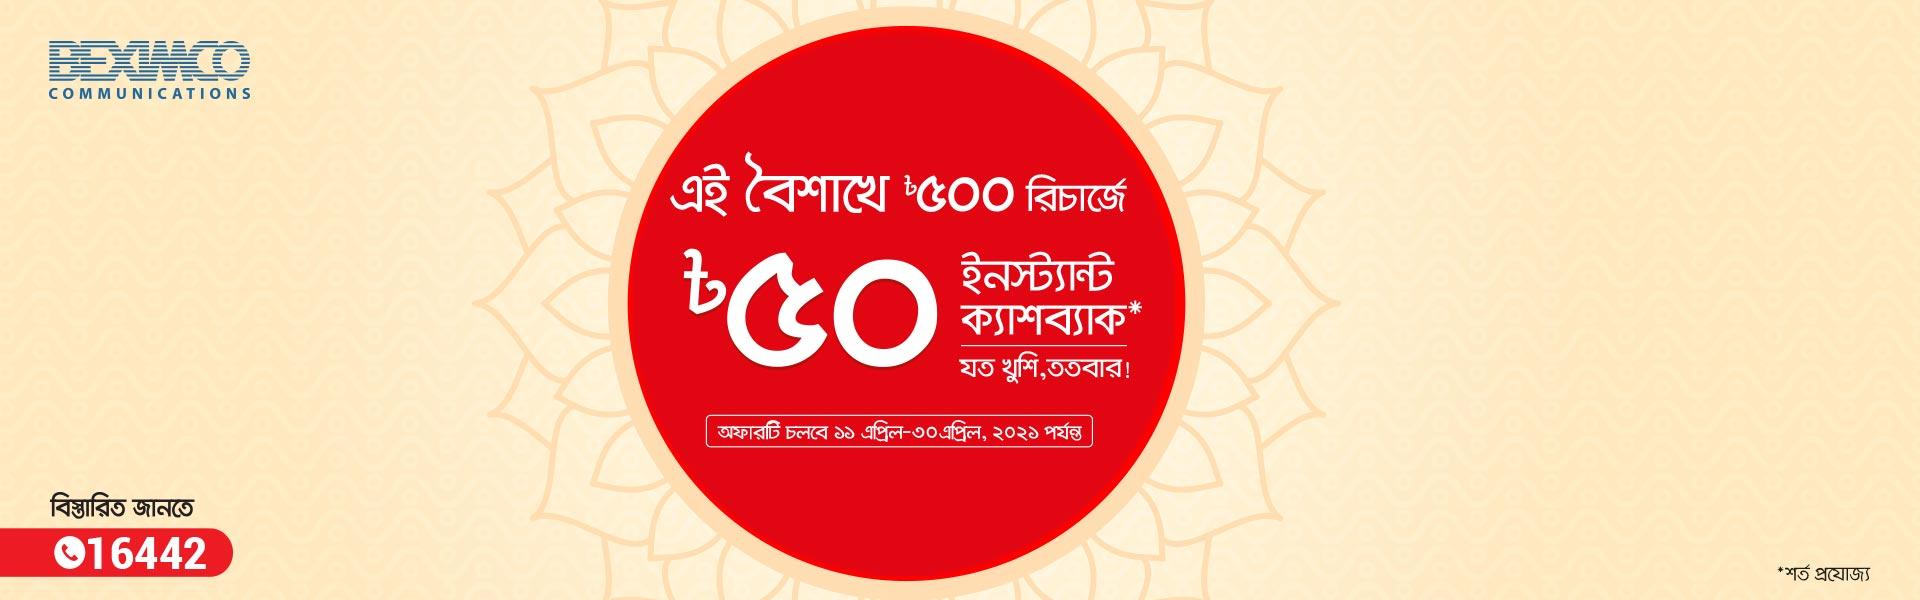 Boishakhi Recharge Campaign